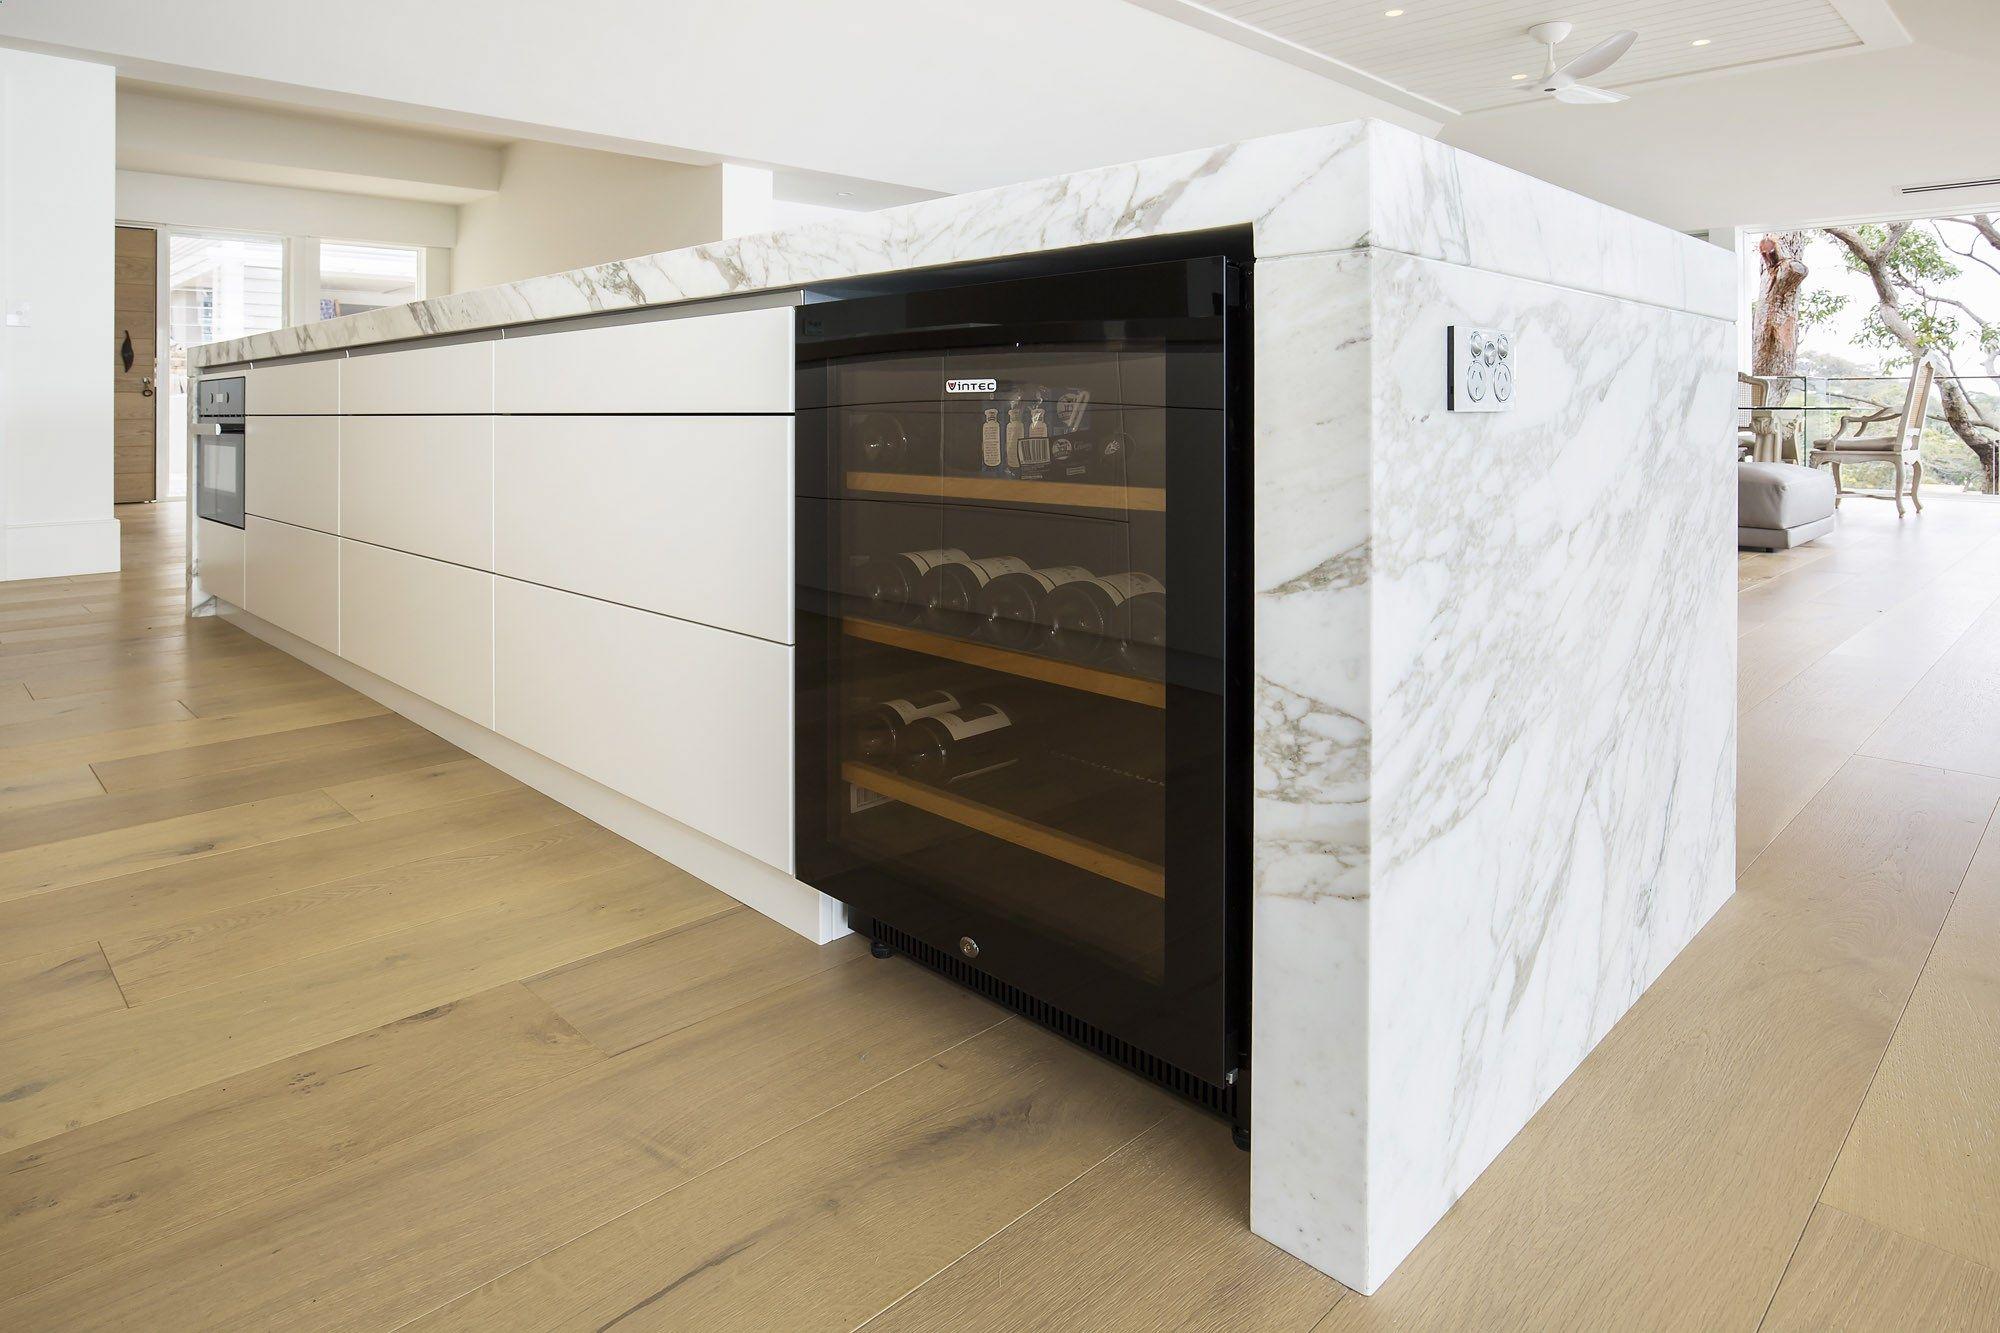 Luxury Refrigerators vintec wine fridge. luxury entertainers kitchen with striking